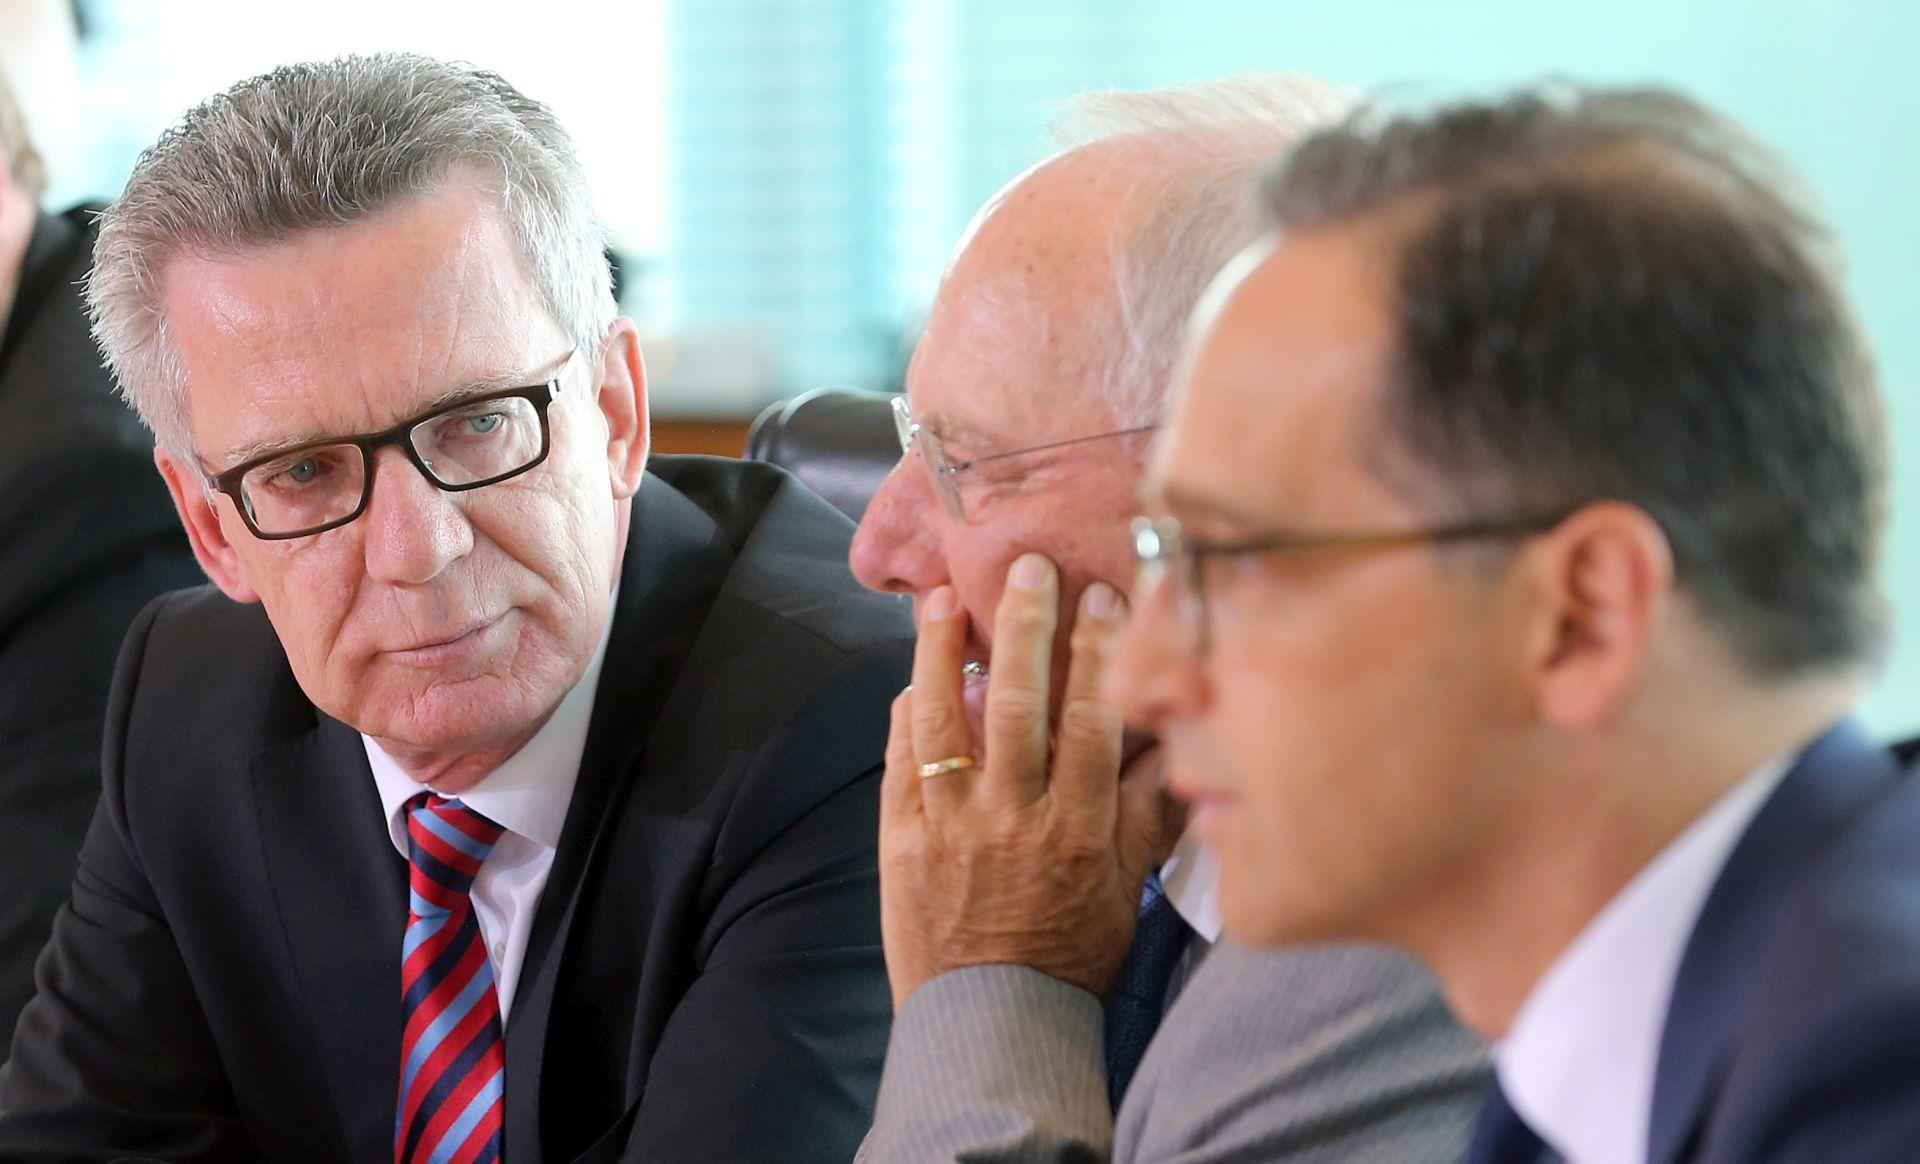 Njemačka za mirovnu misiju UN-a u istočnoj Ukrajini